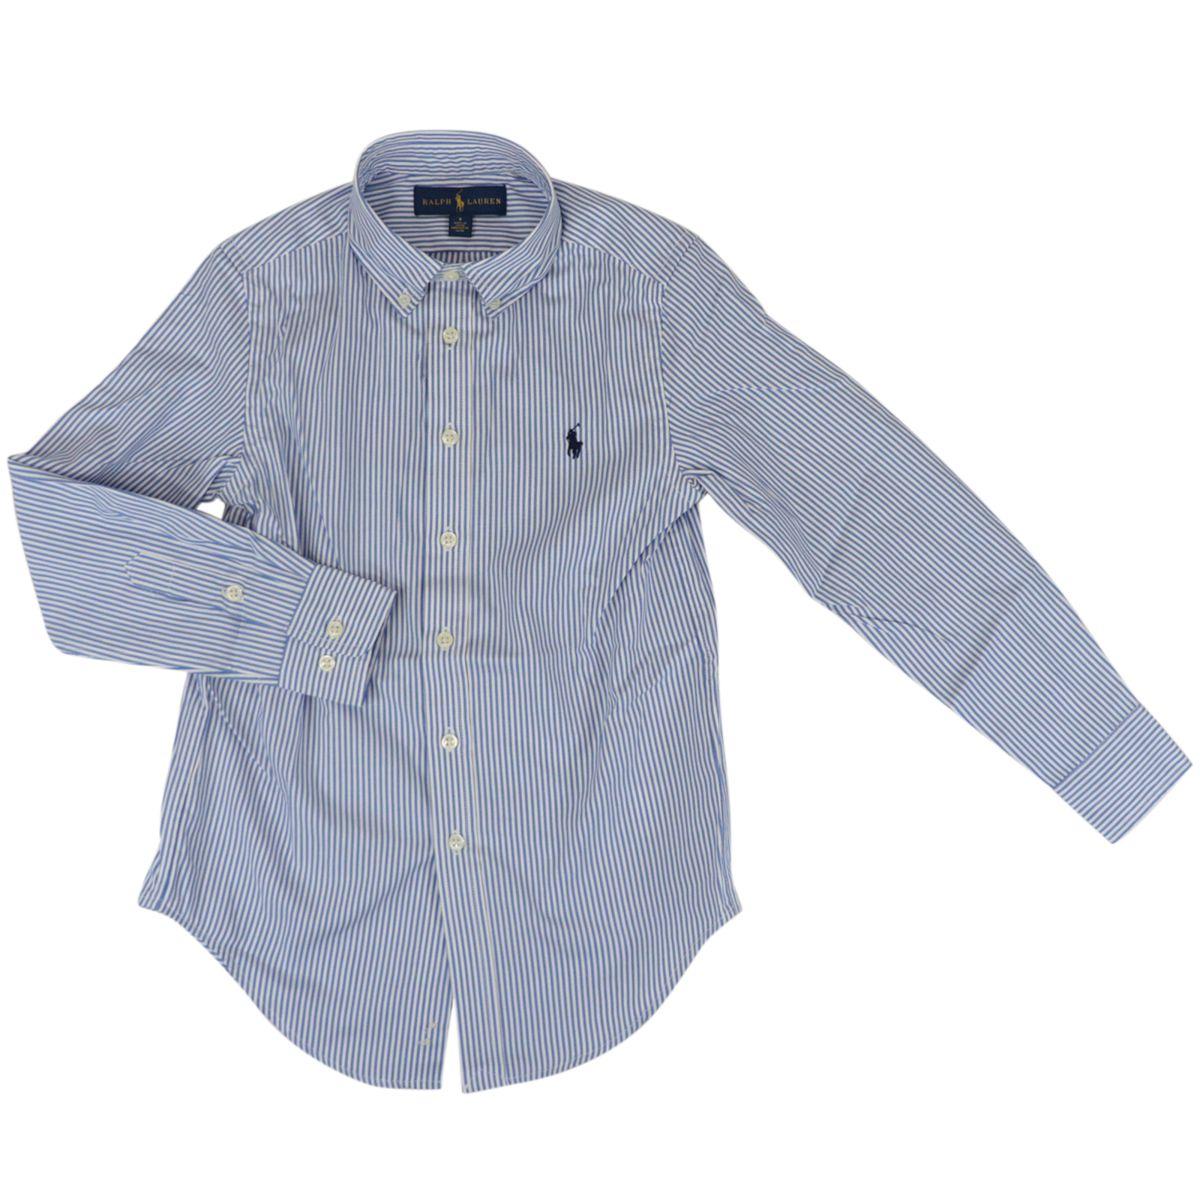 Cotton shirt with botton down collar Blue / white Polo Ralph Lauren